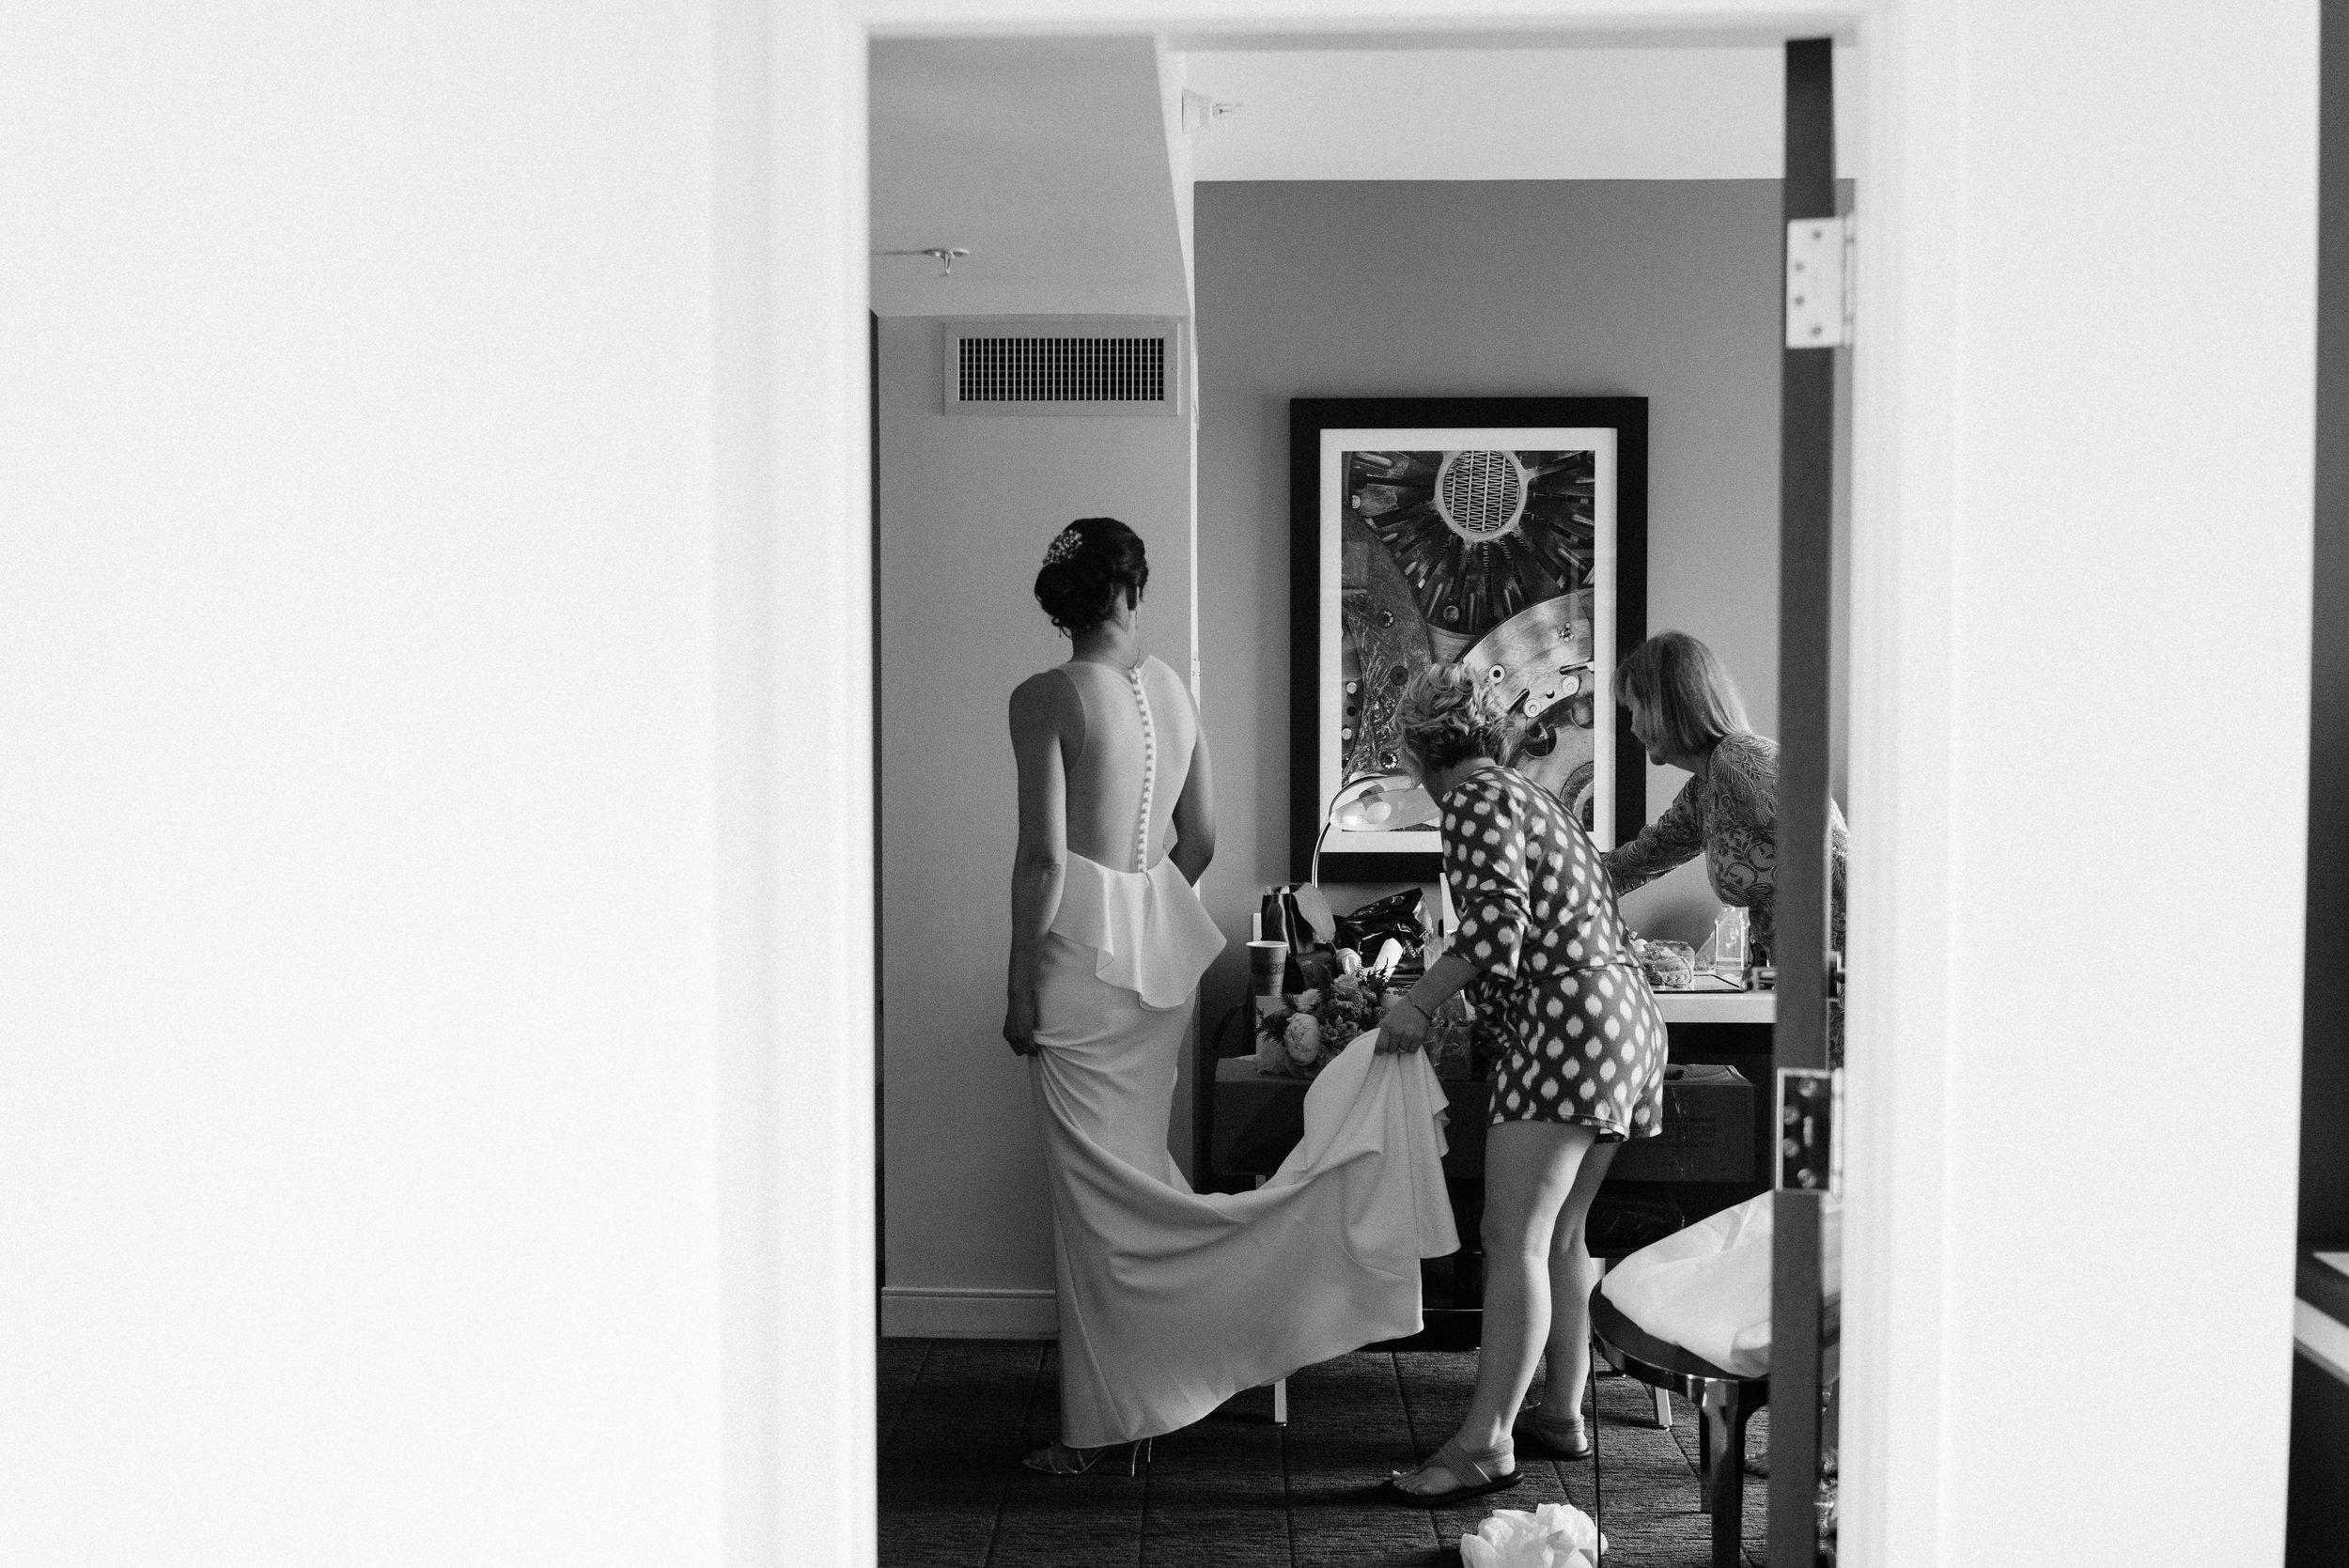 Patricia-Steve-Blog-Indianapolis-Wedding-25.jpg